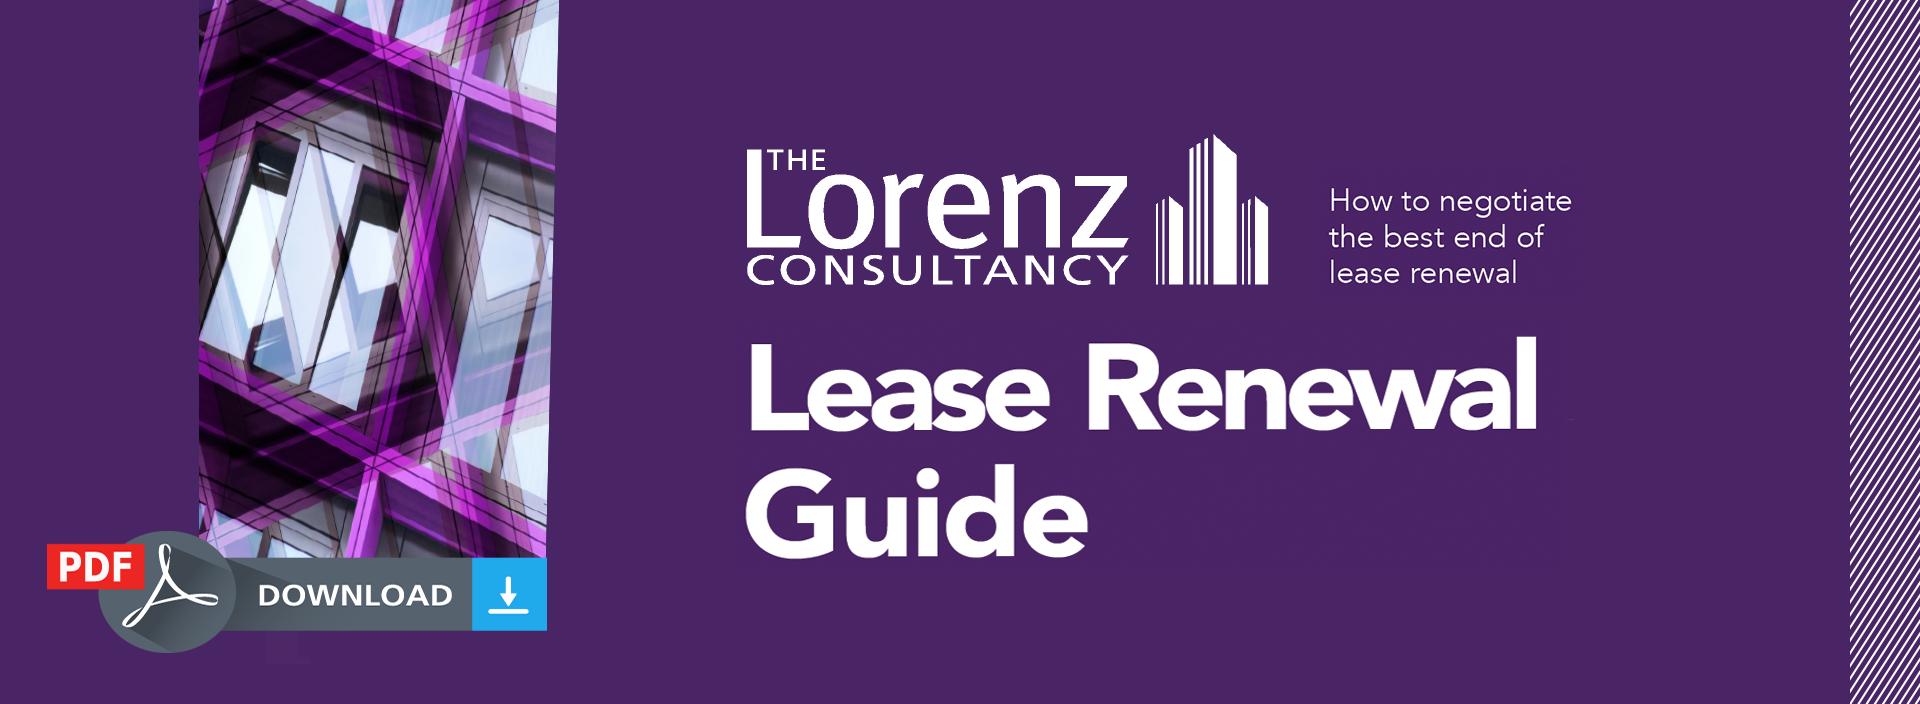 Lease Renewal Guide - Landing Page Header.png